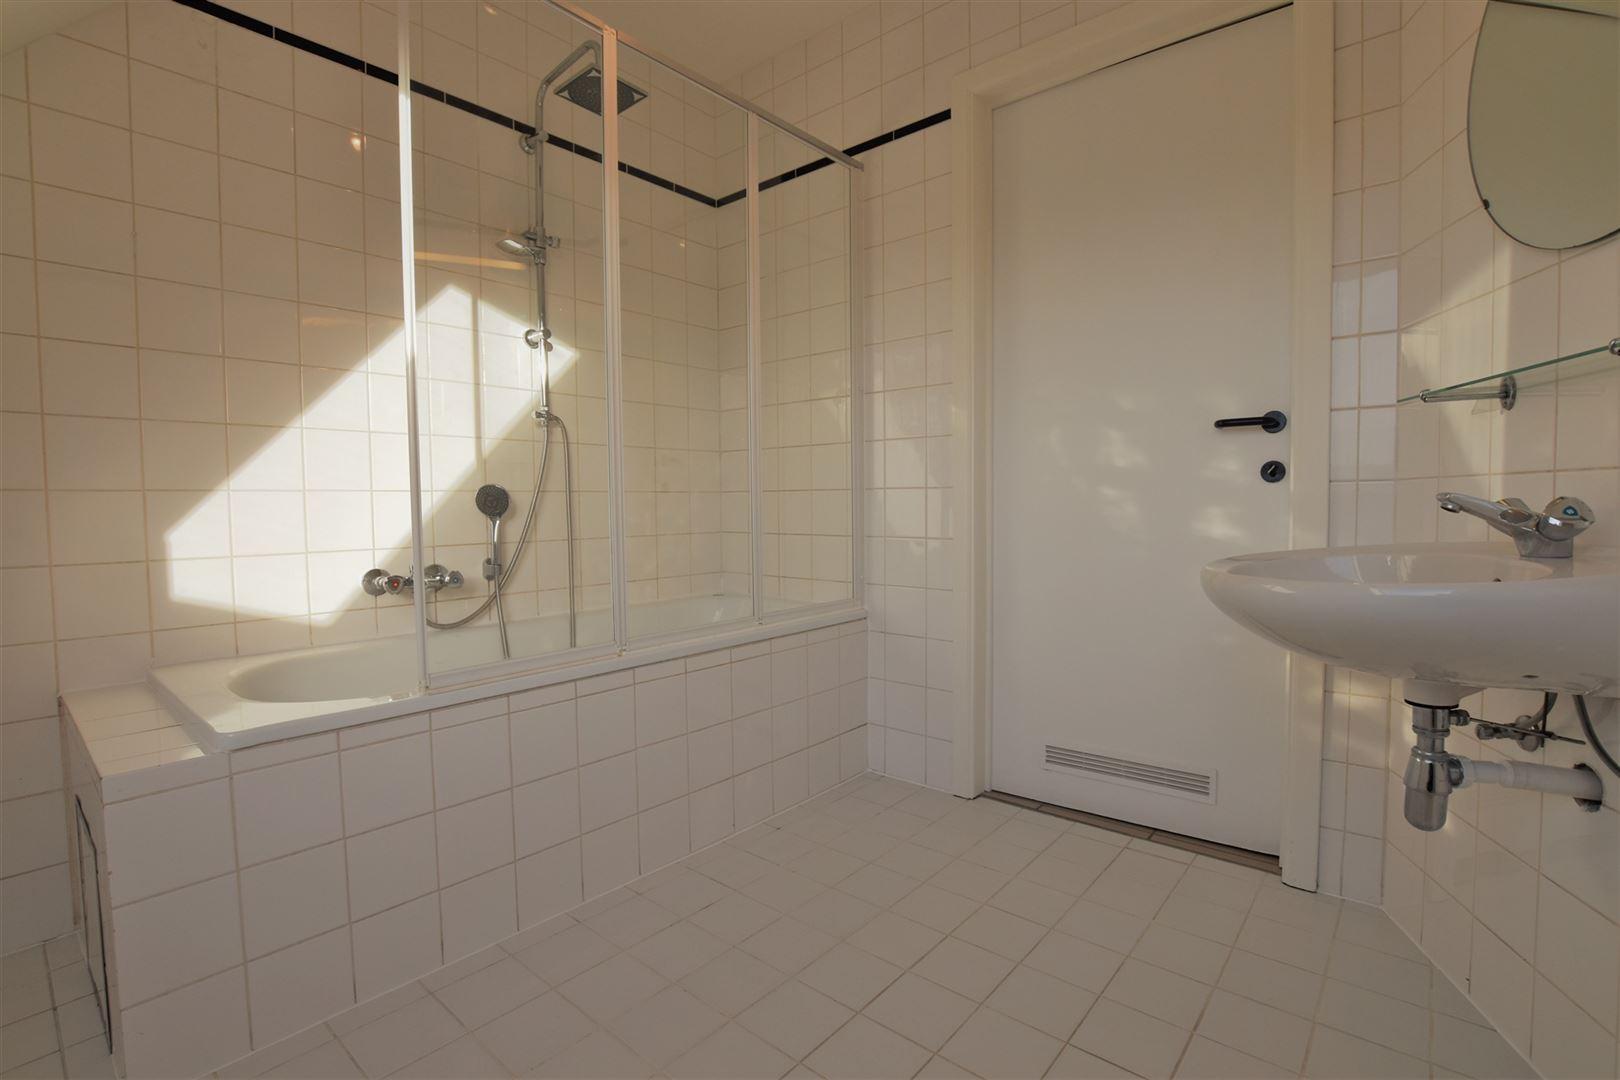 Foto 15 : Appartement te 9280 Lebbeke (België) - Prijs € 645